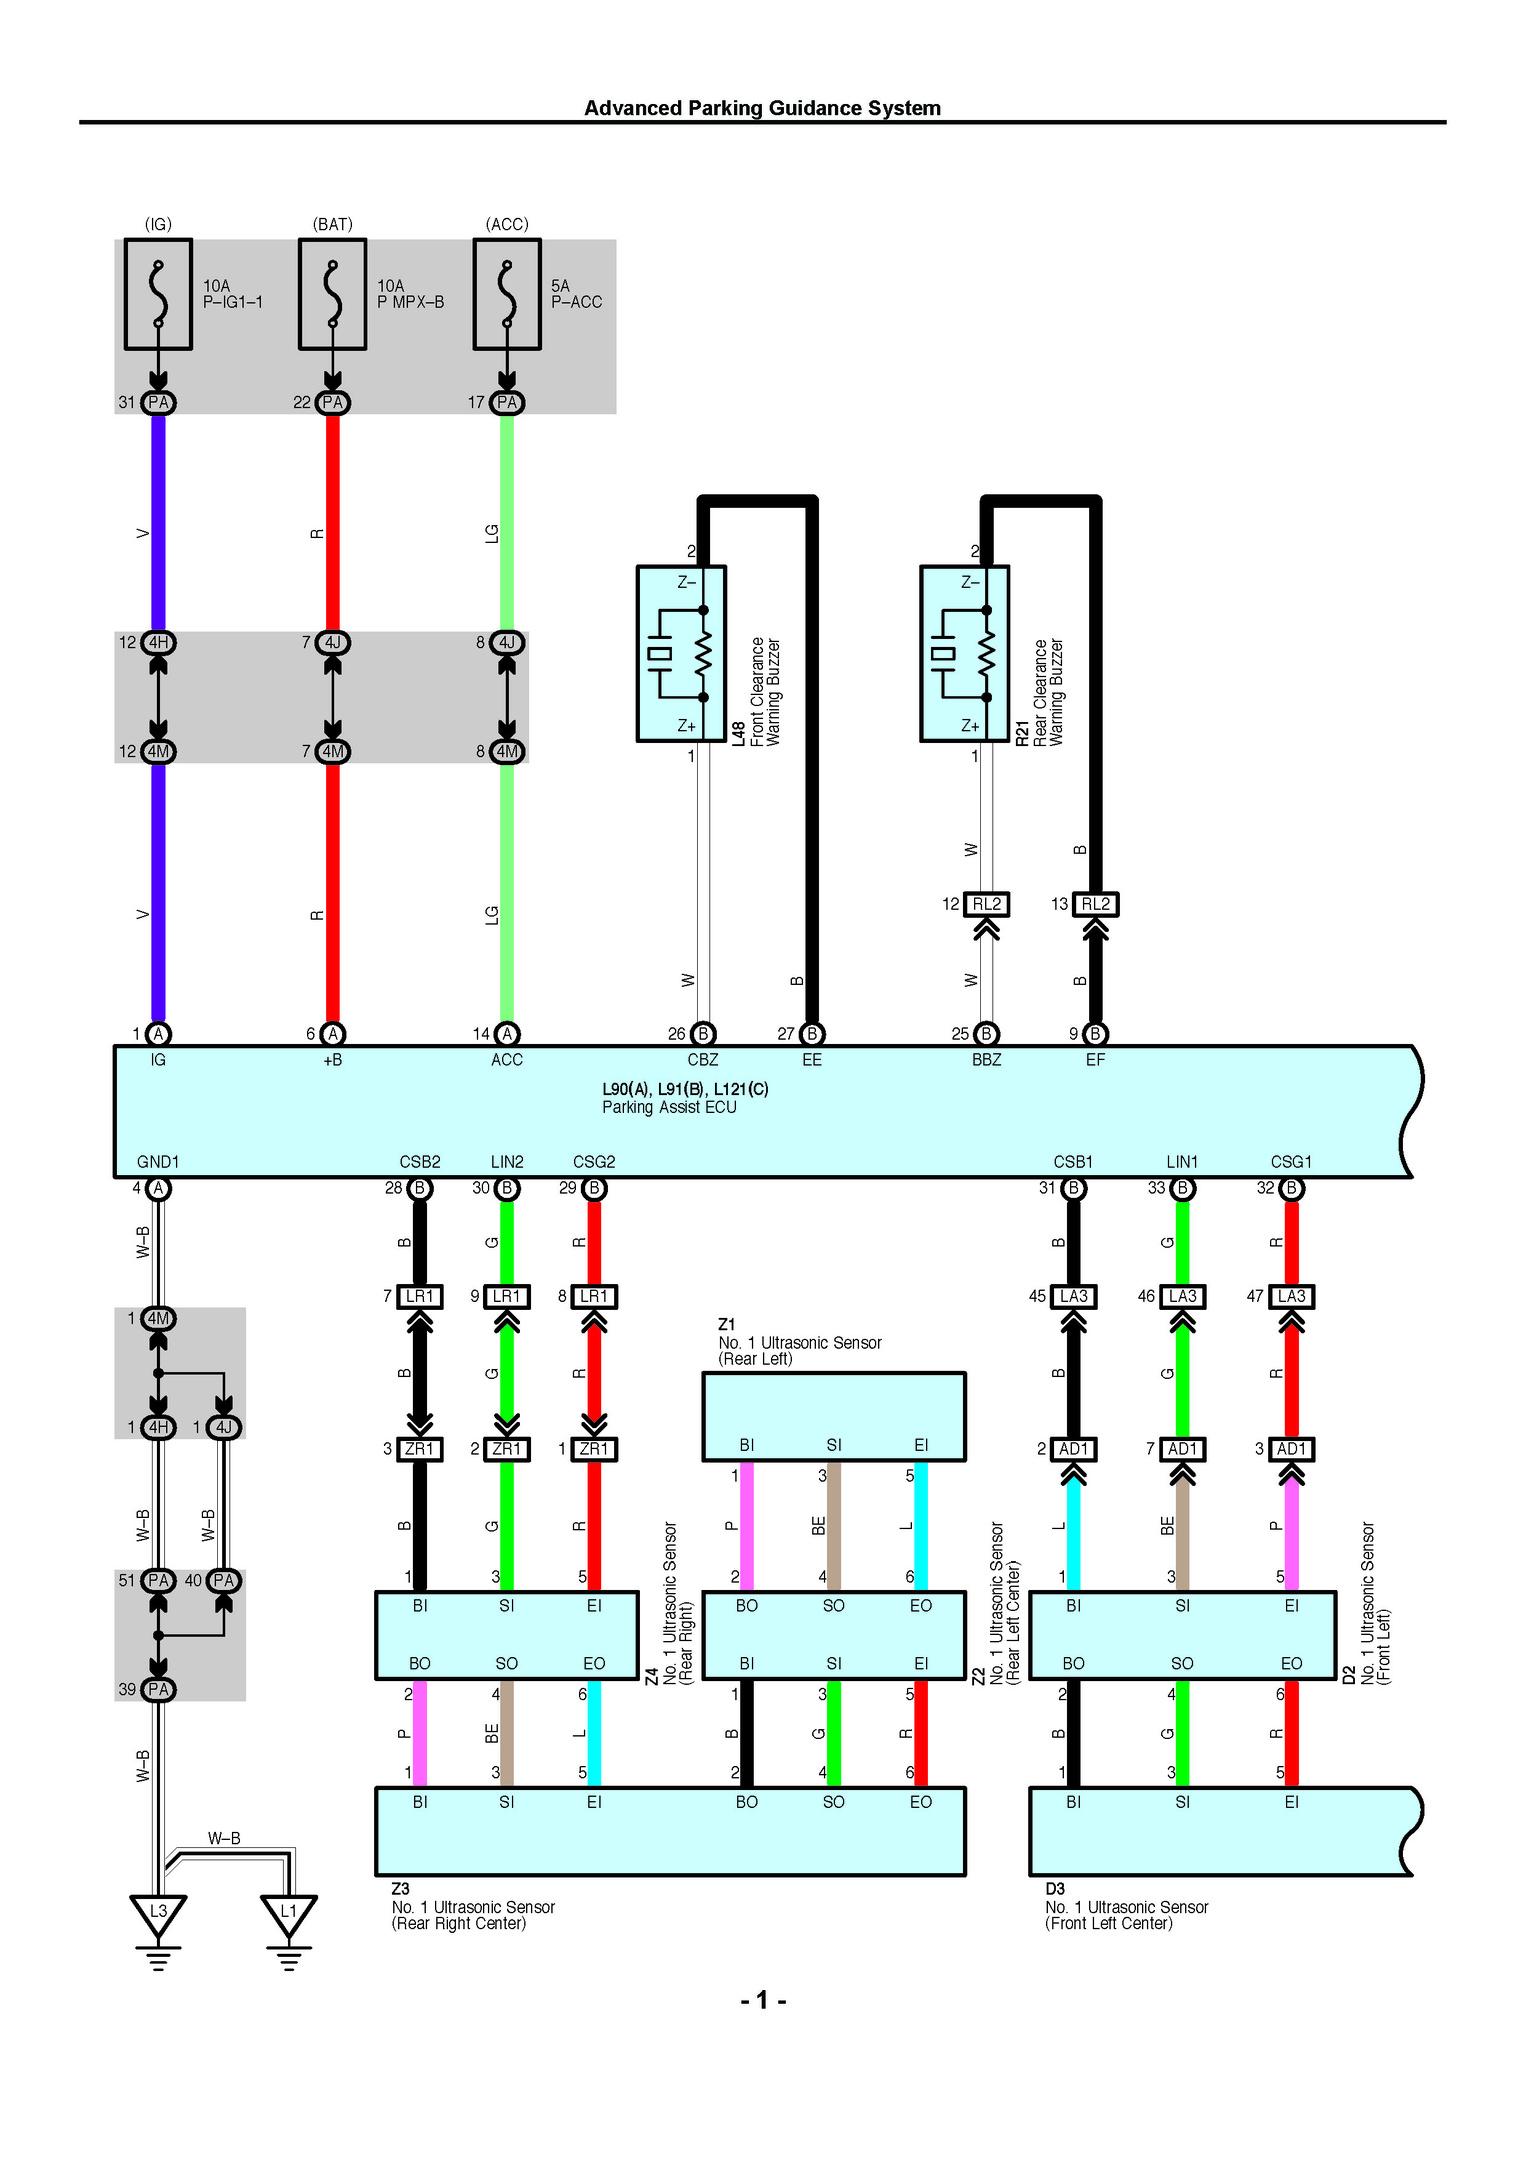 Lexus Ls 460 Wiring Diagram Manual Guide Lfa Free 2007 Ls460l Ls460 Oem Electrical Rh Sellfy Com Lc500